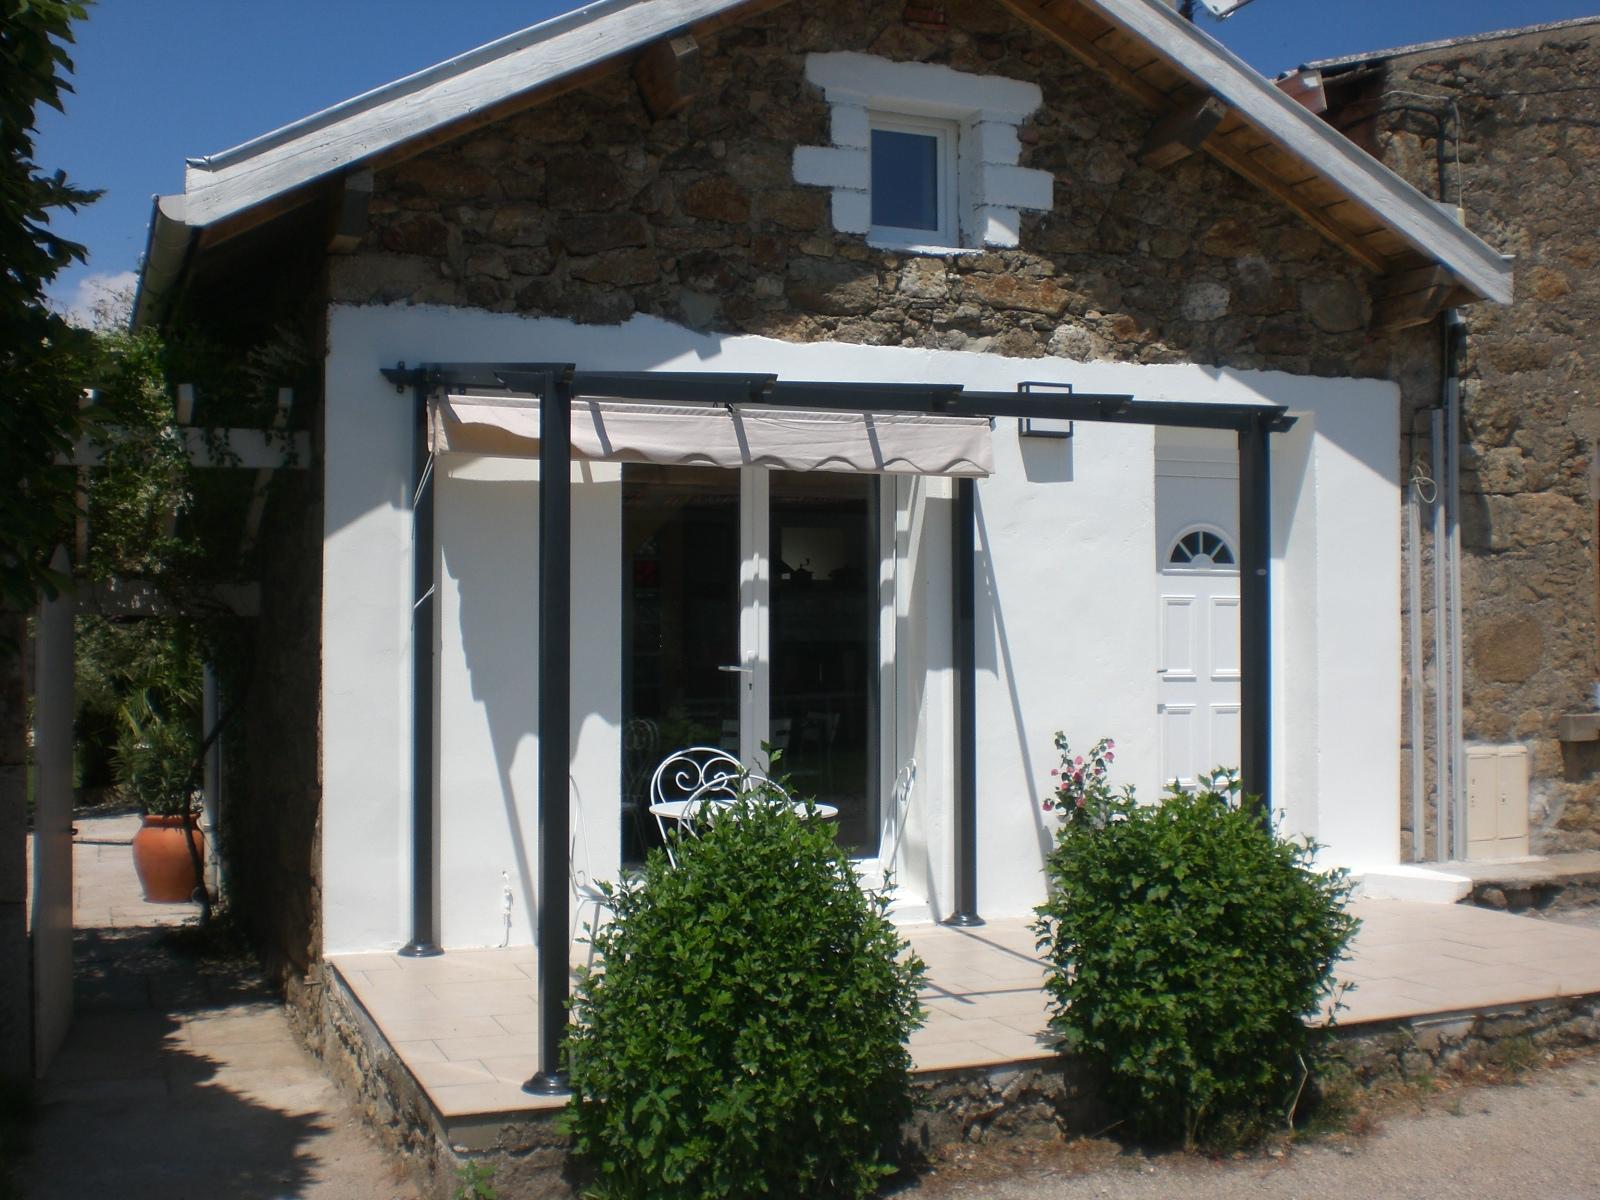 Location M. Patrick Rouchon (Saint-Romain-dAy,Ardèche), Fu